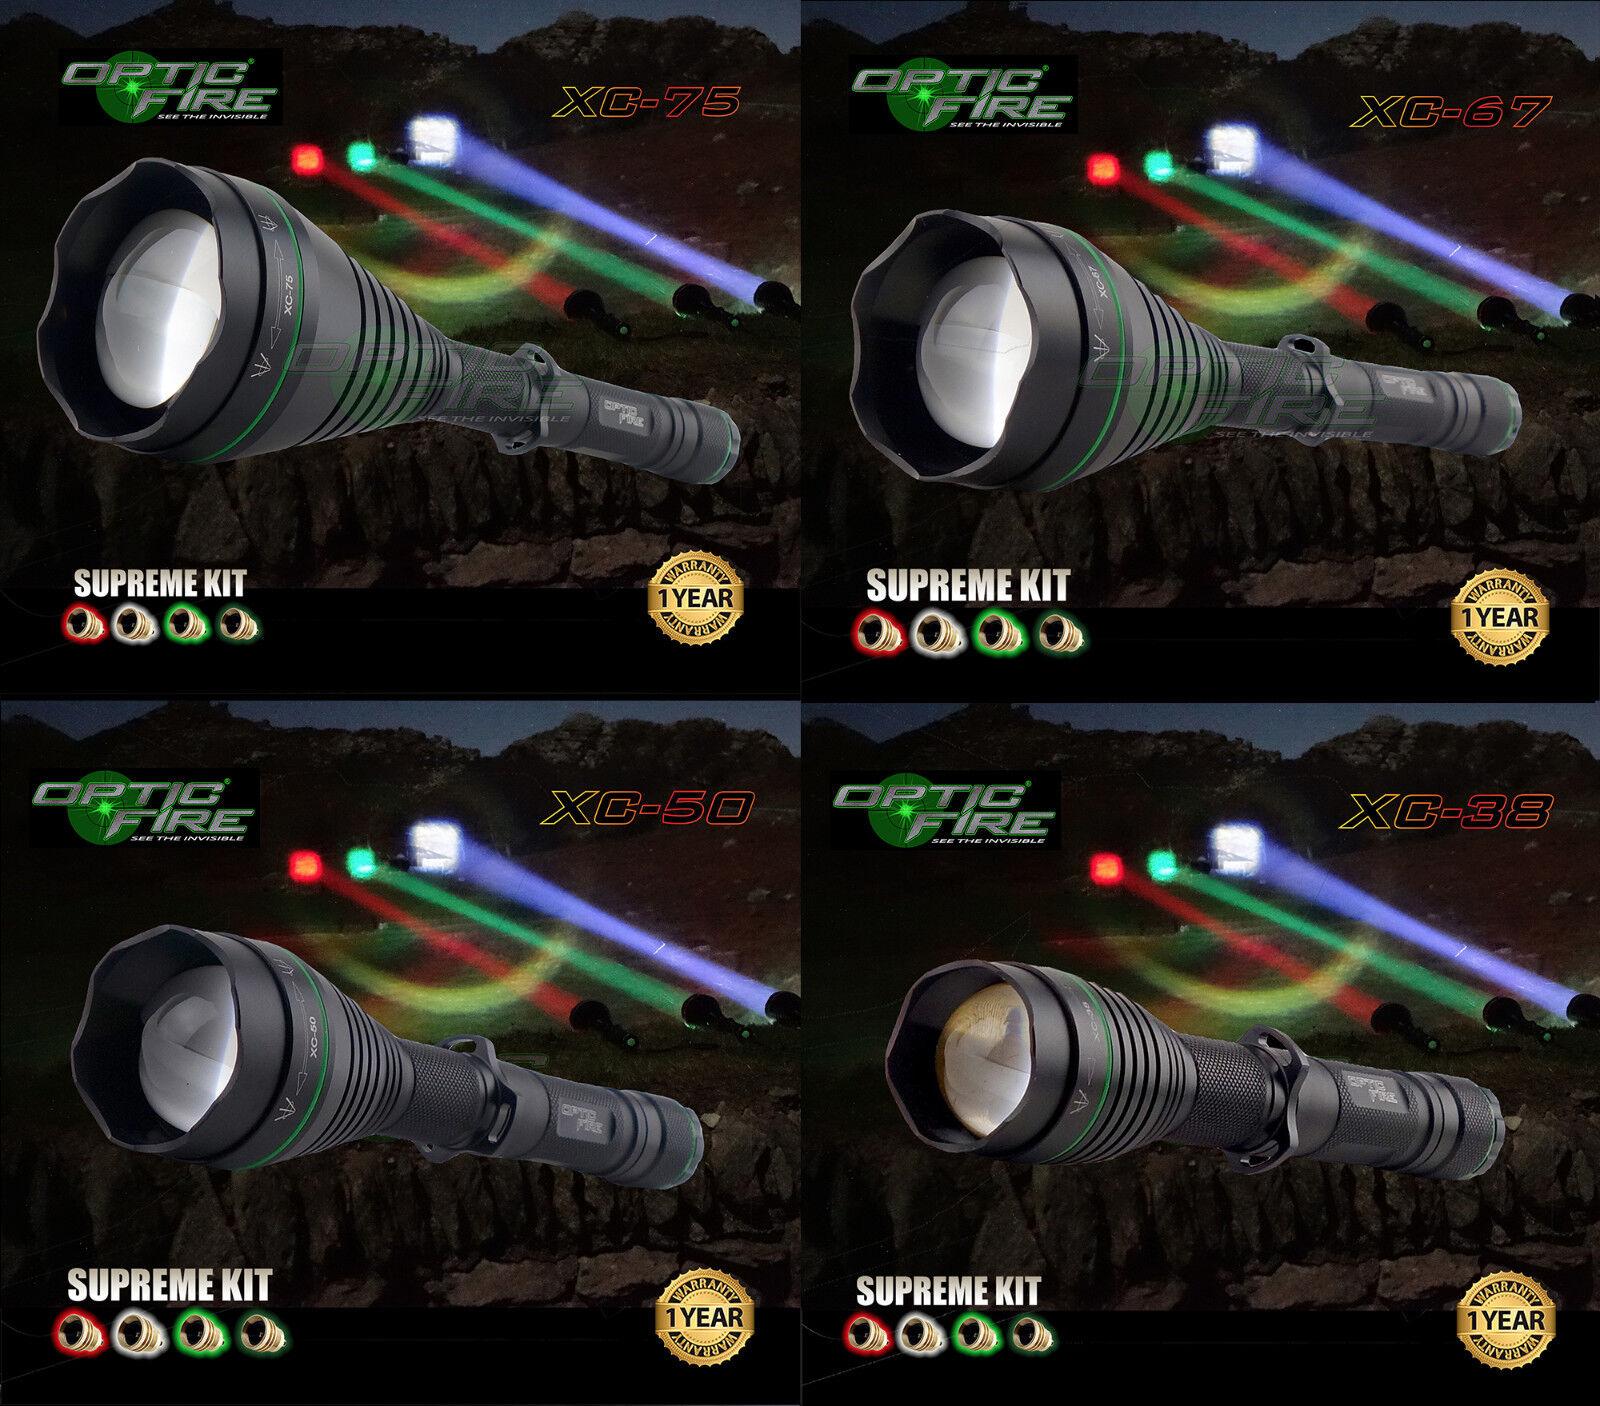 Opticfire ® AG 4 DEL haute puissance suprême Chasse Lampe torche NV Lampe Lamping Kit